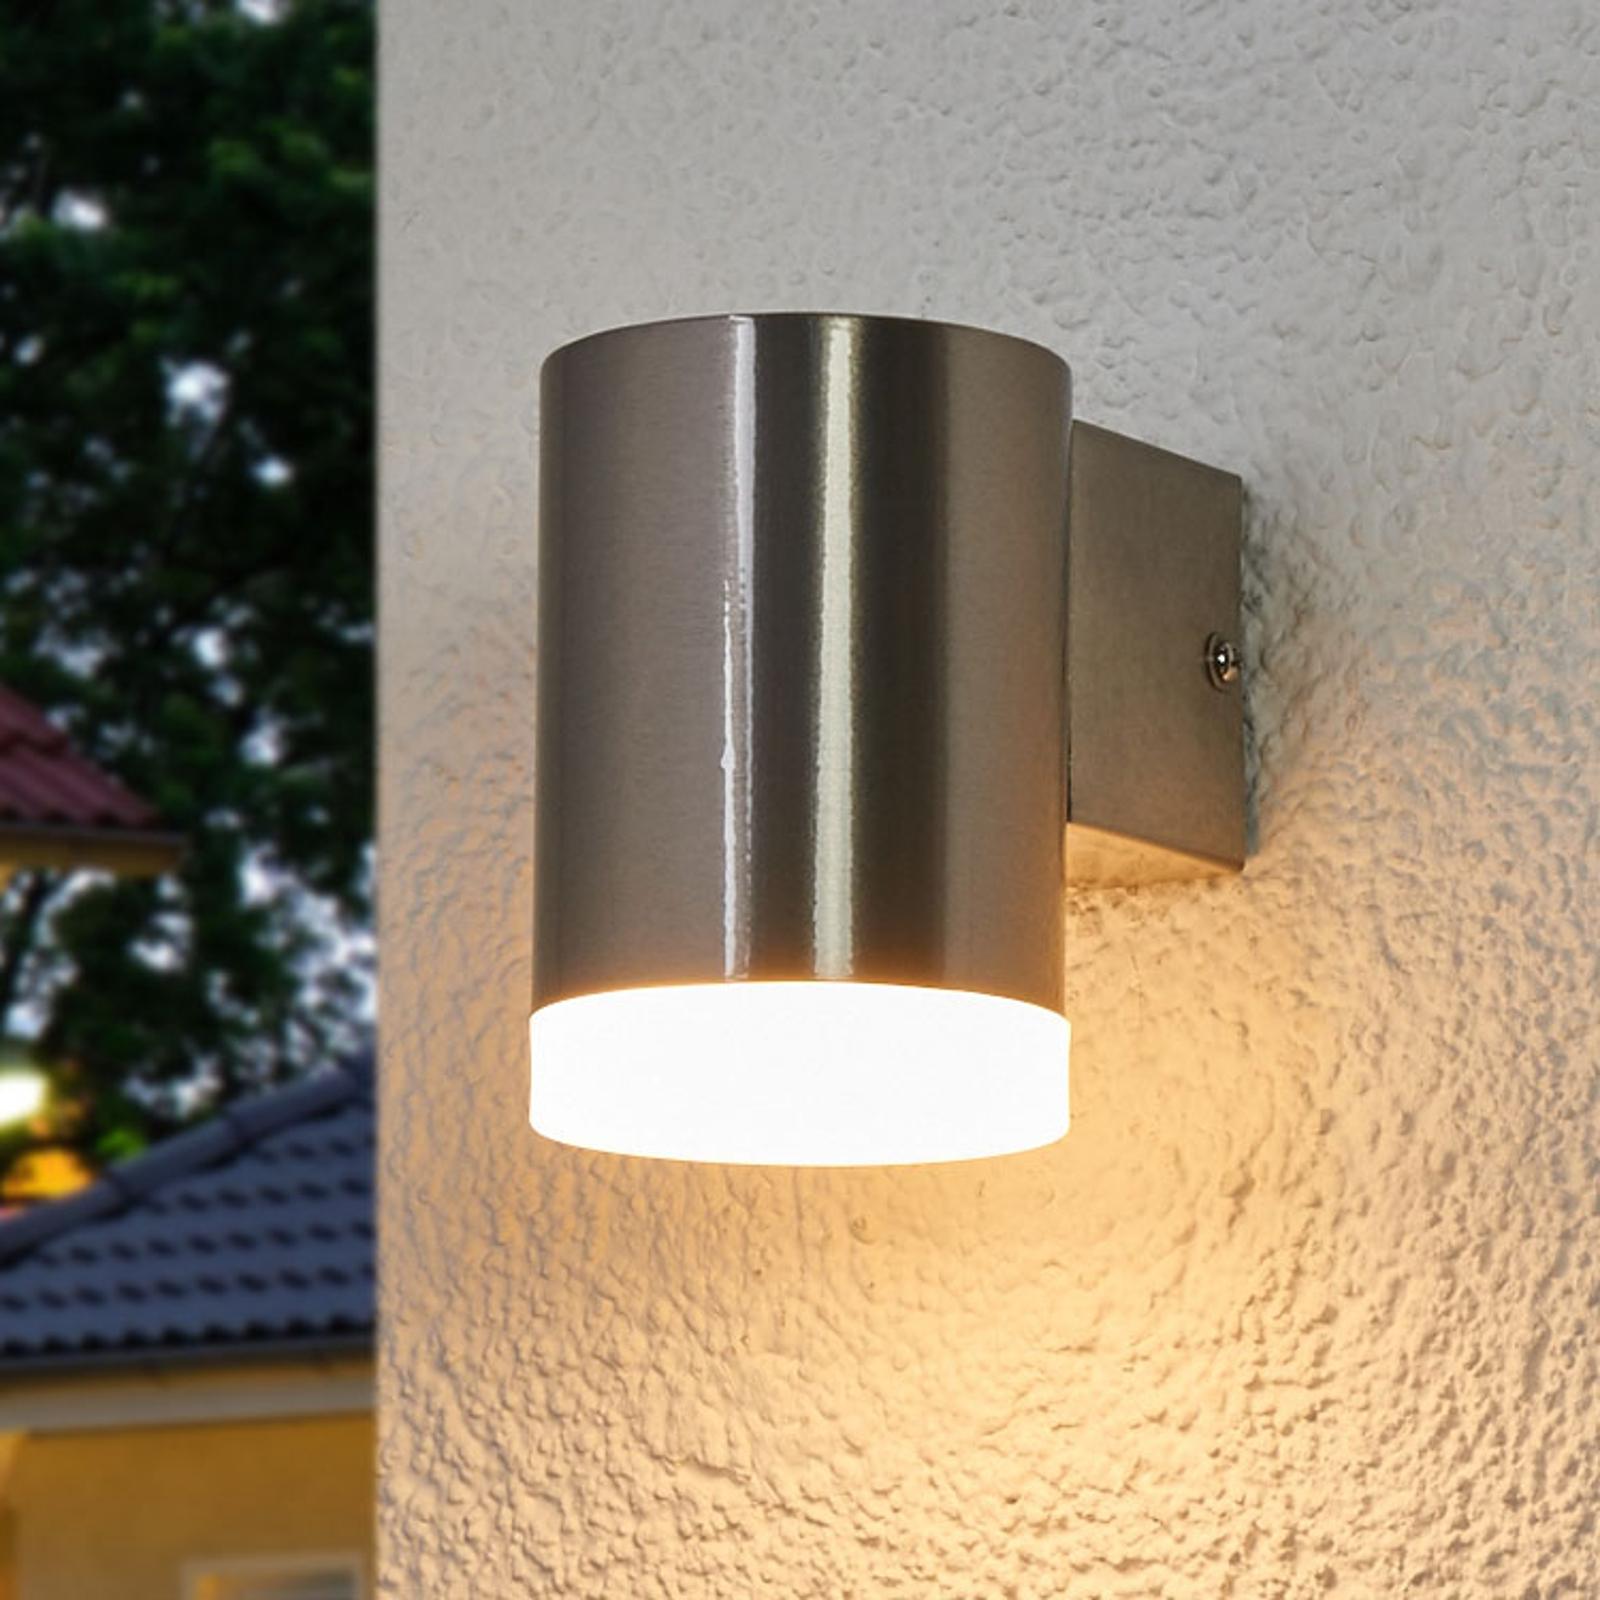 Downward facing LED outdoor wall light Eliano_9988088_1